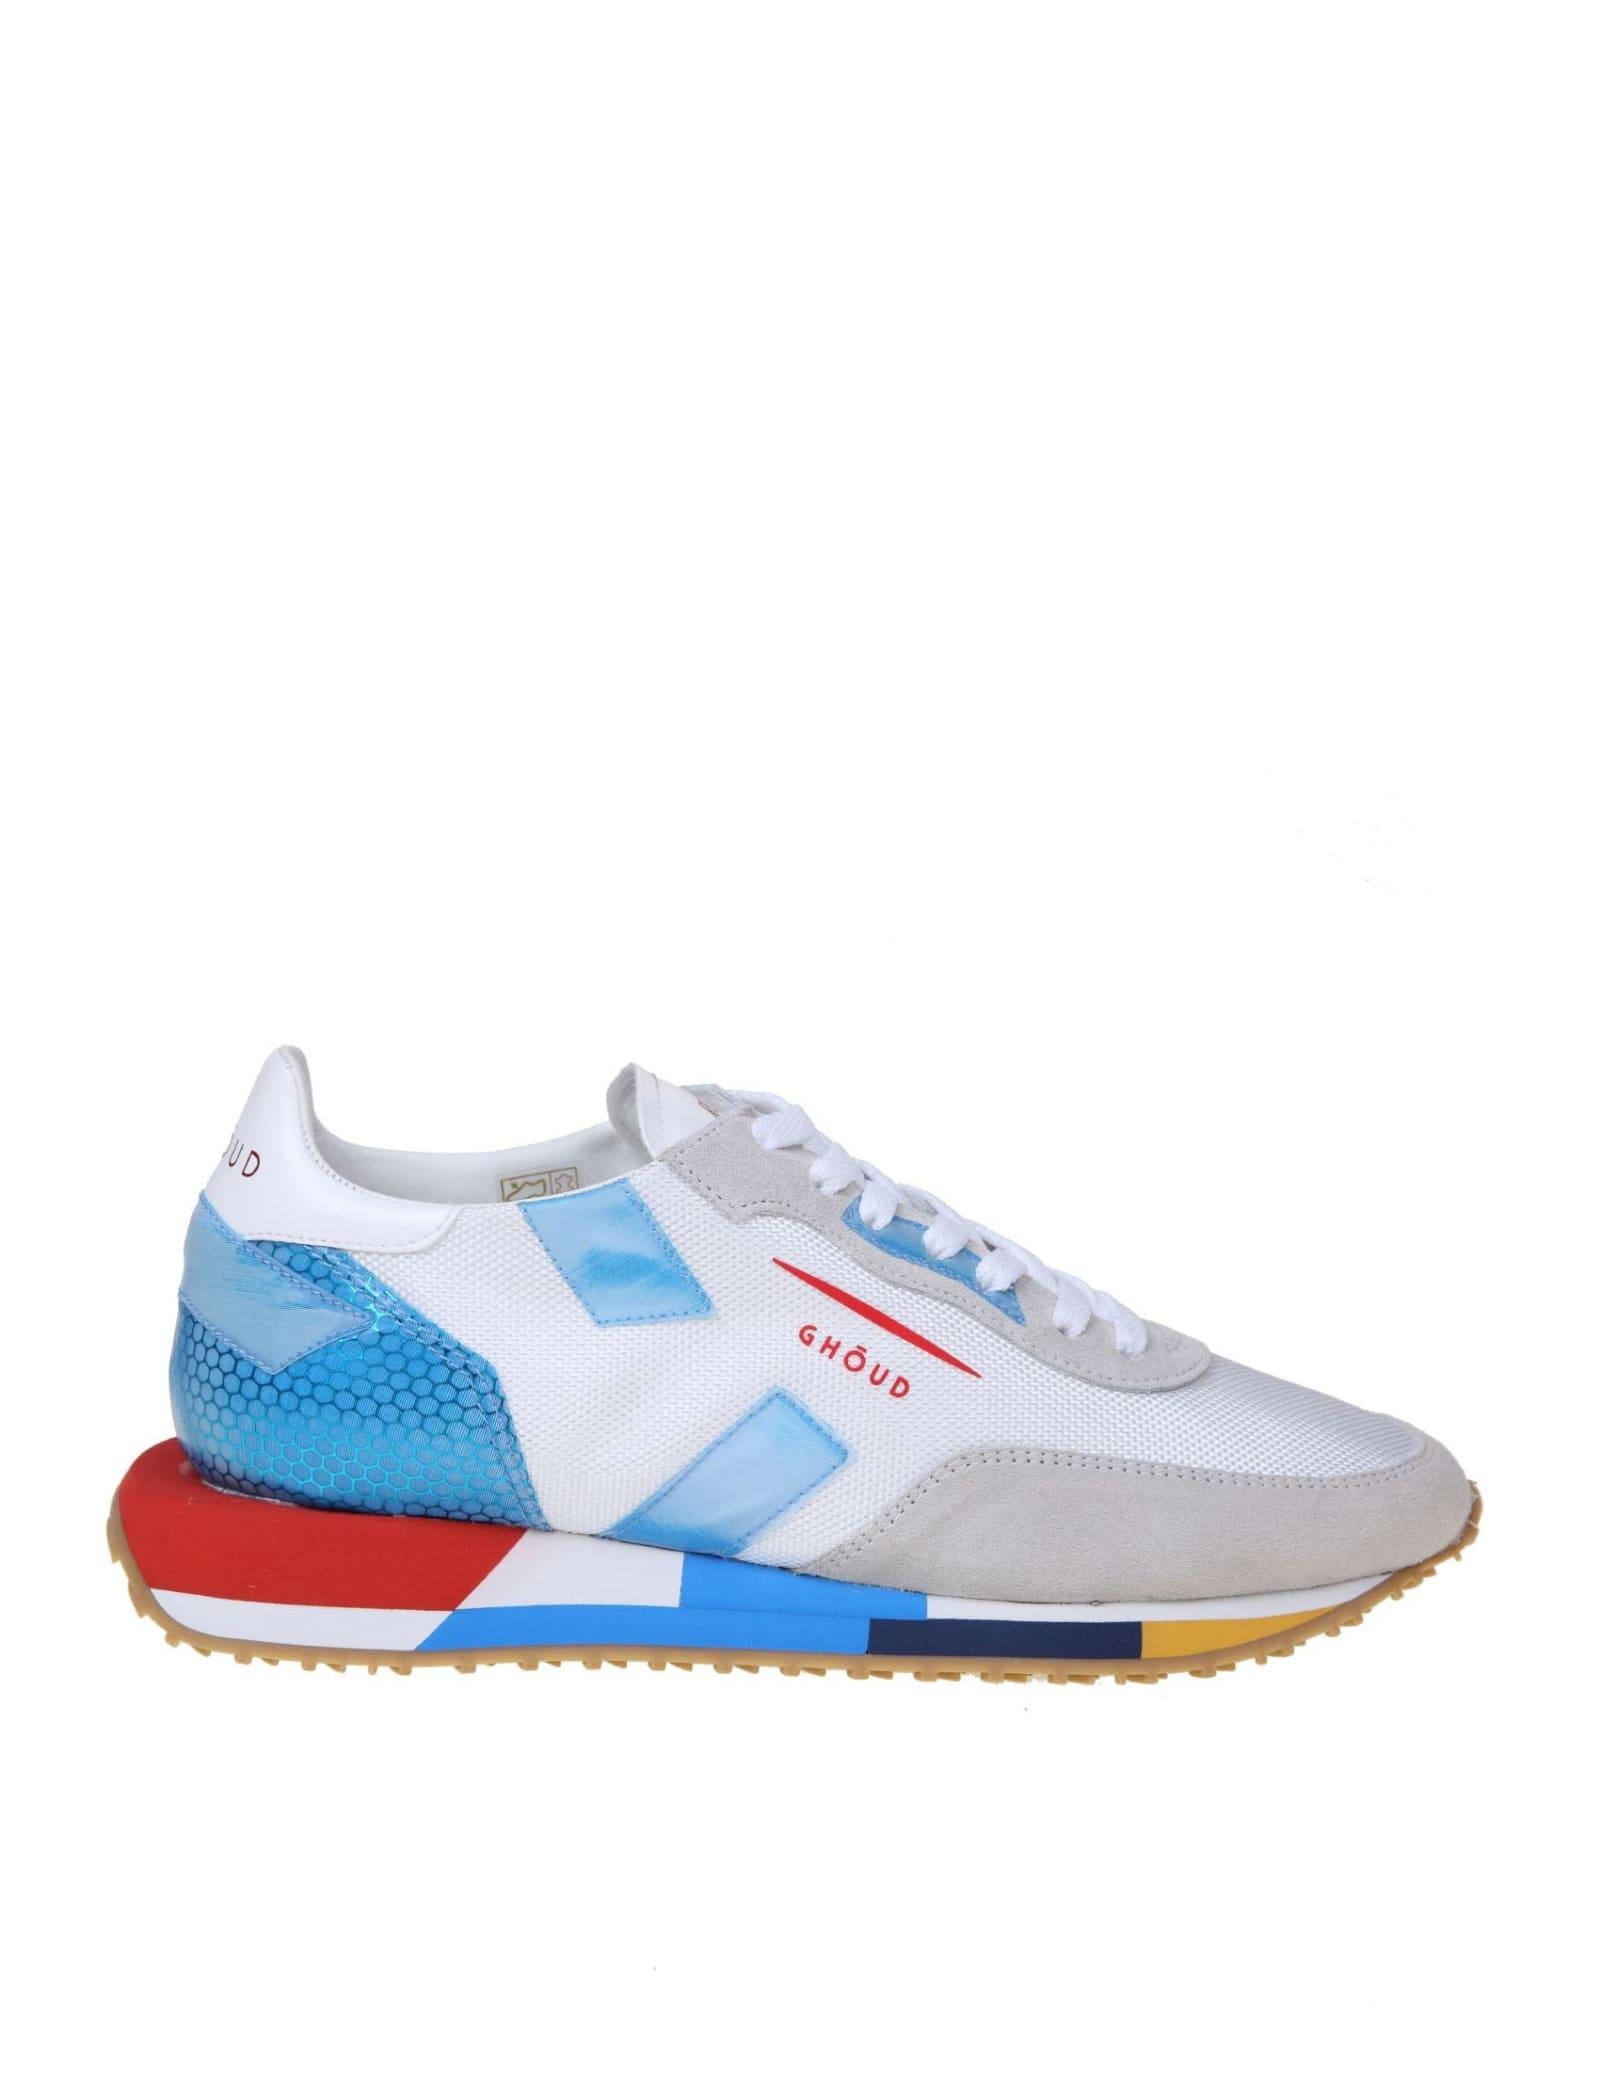 Ghoud Rush Sneakers In White Fabric